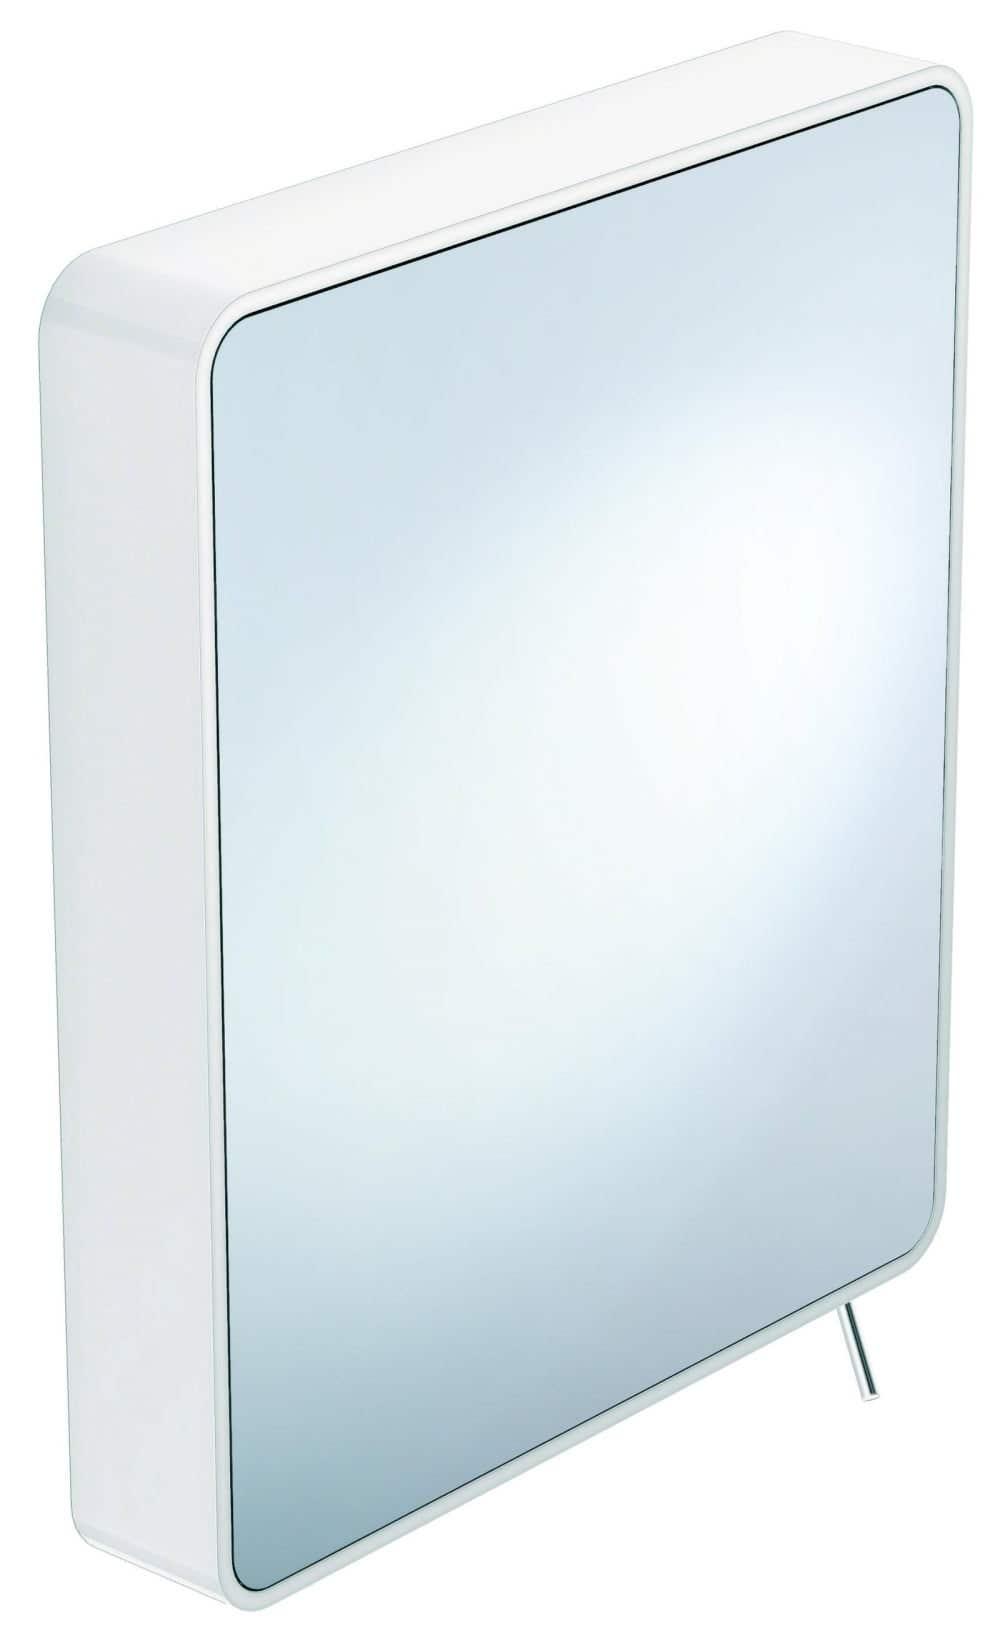 Accessoires HEWI Kippspiegel System 800